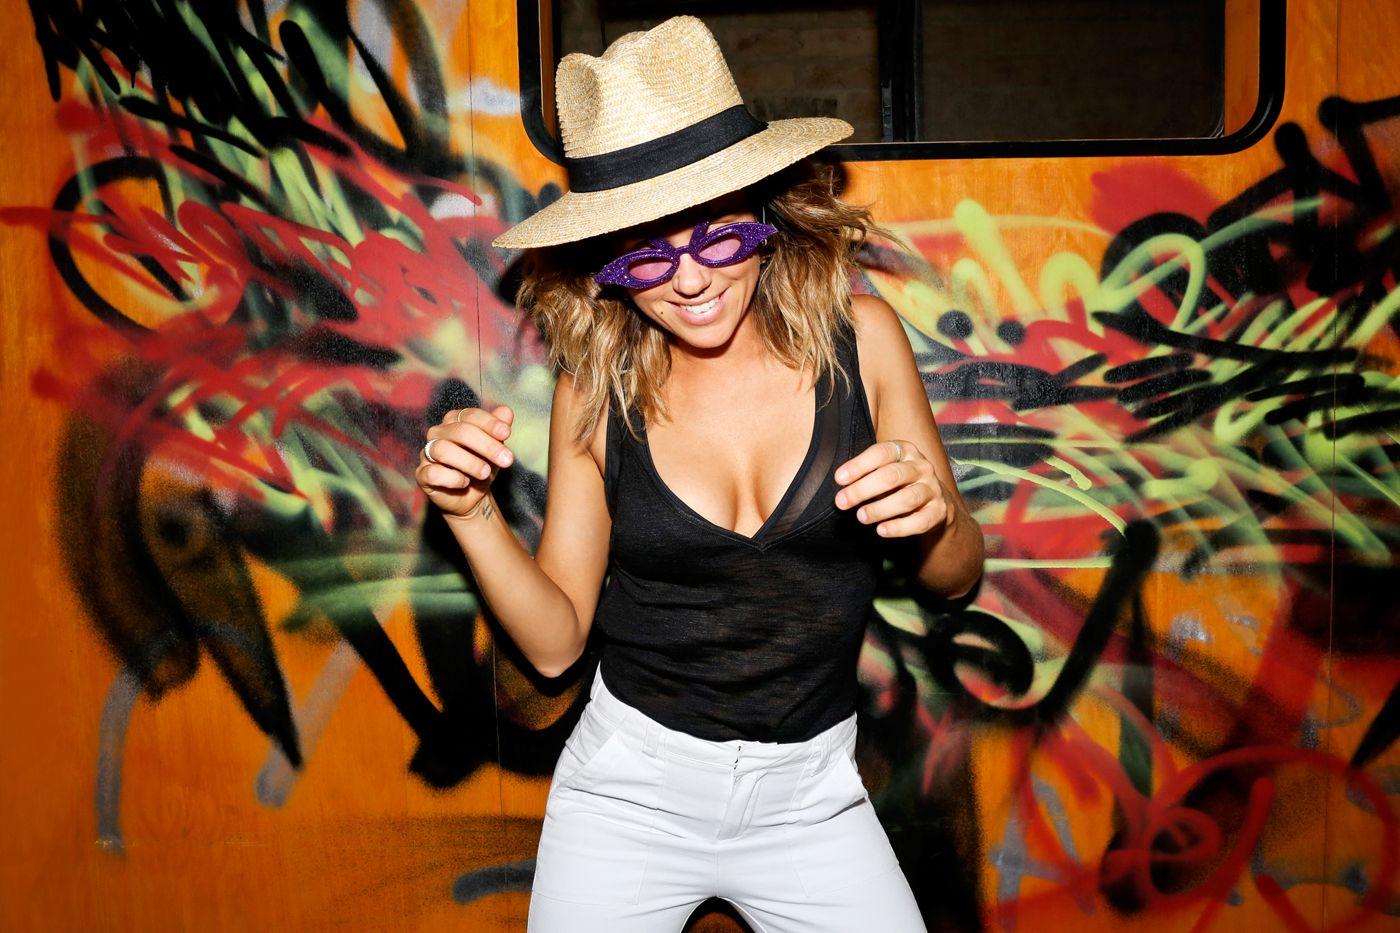 #pipedwards #party #weekend #fashion #babe #swim #womenswear #style #crazy